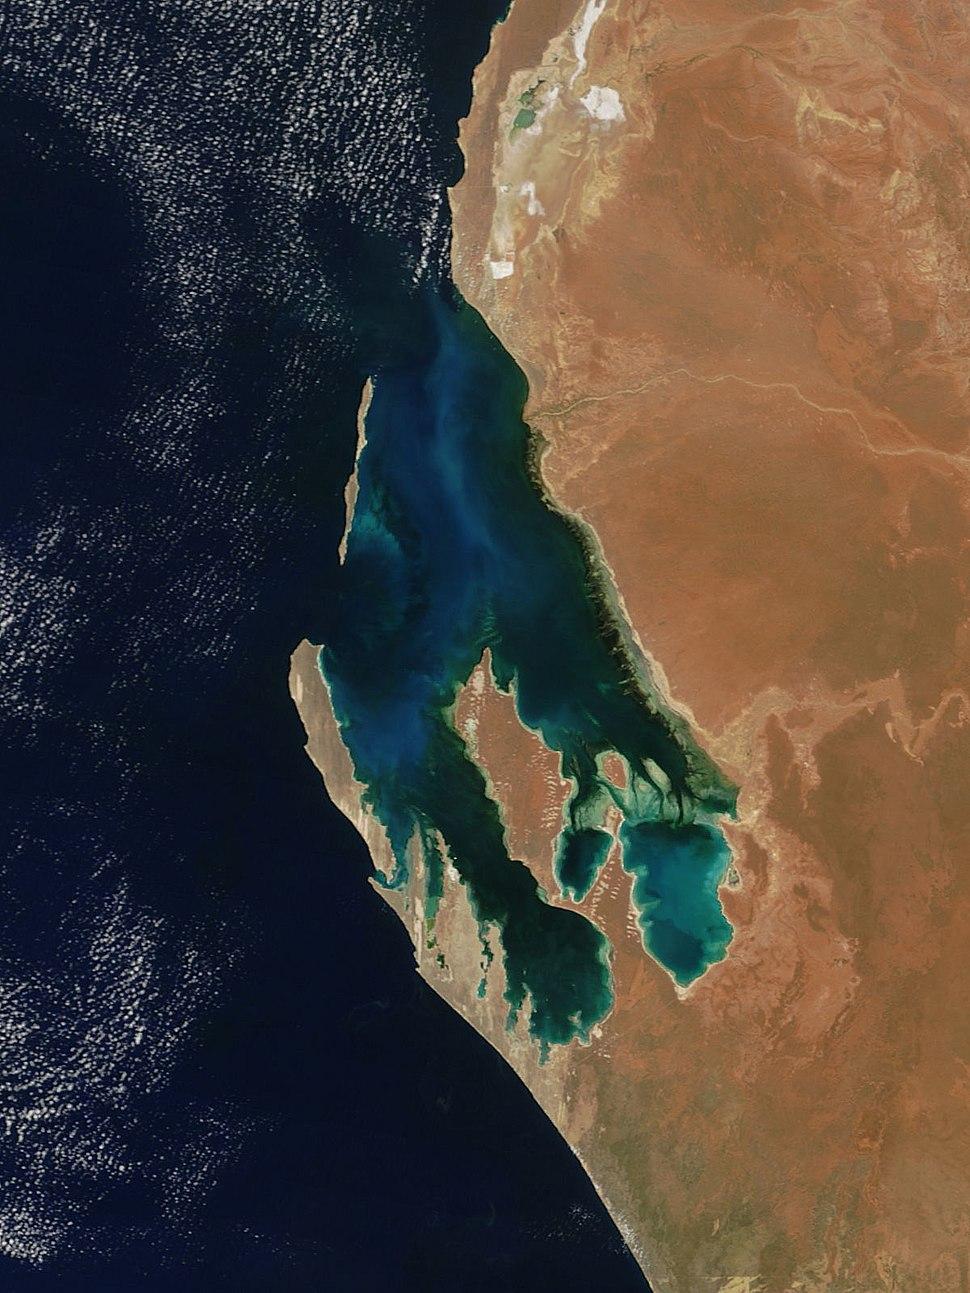 Shark Bay Phytoplankton in Bloom